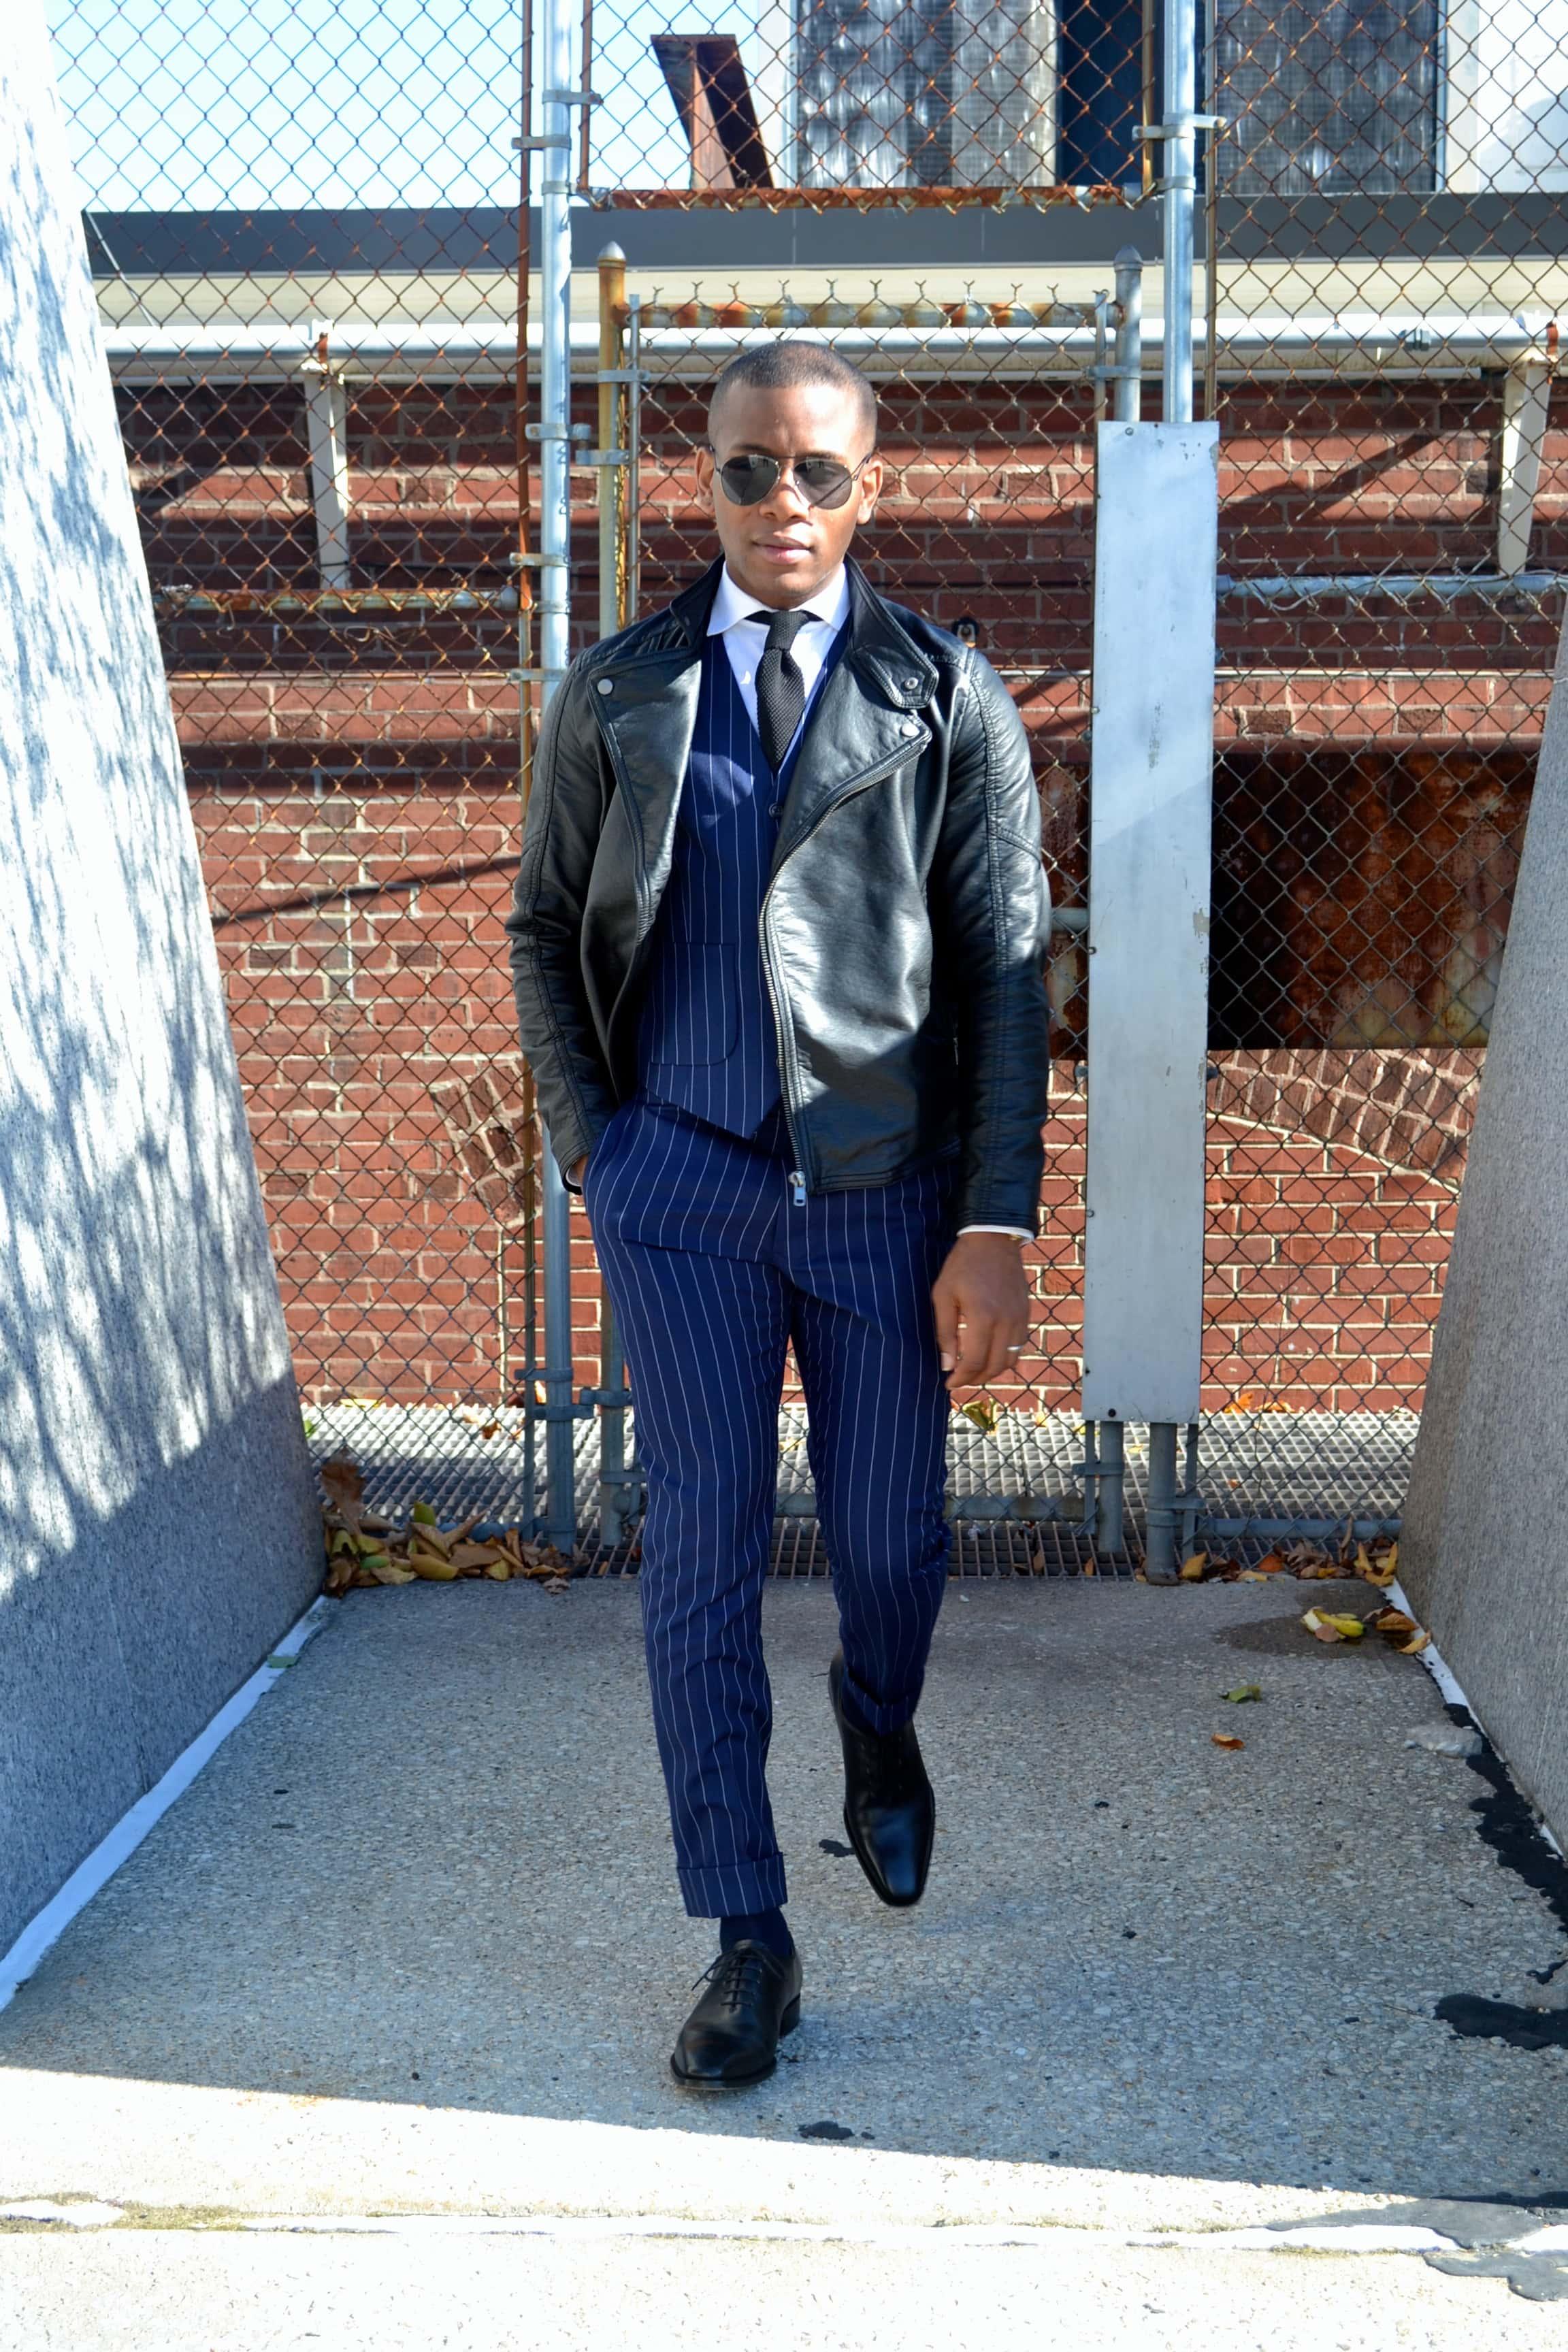 Imparali Custom Tailors Chalk Striped Edinburgh Suit Review Men's Style Pro